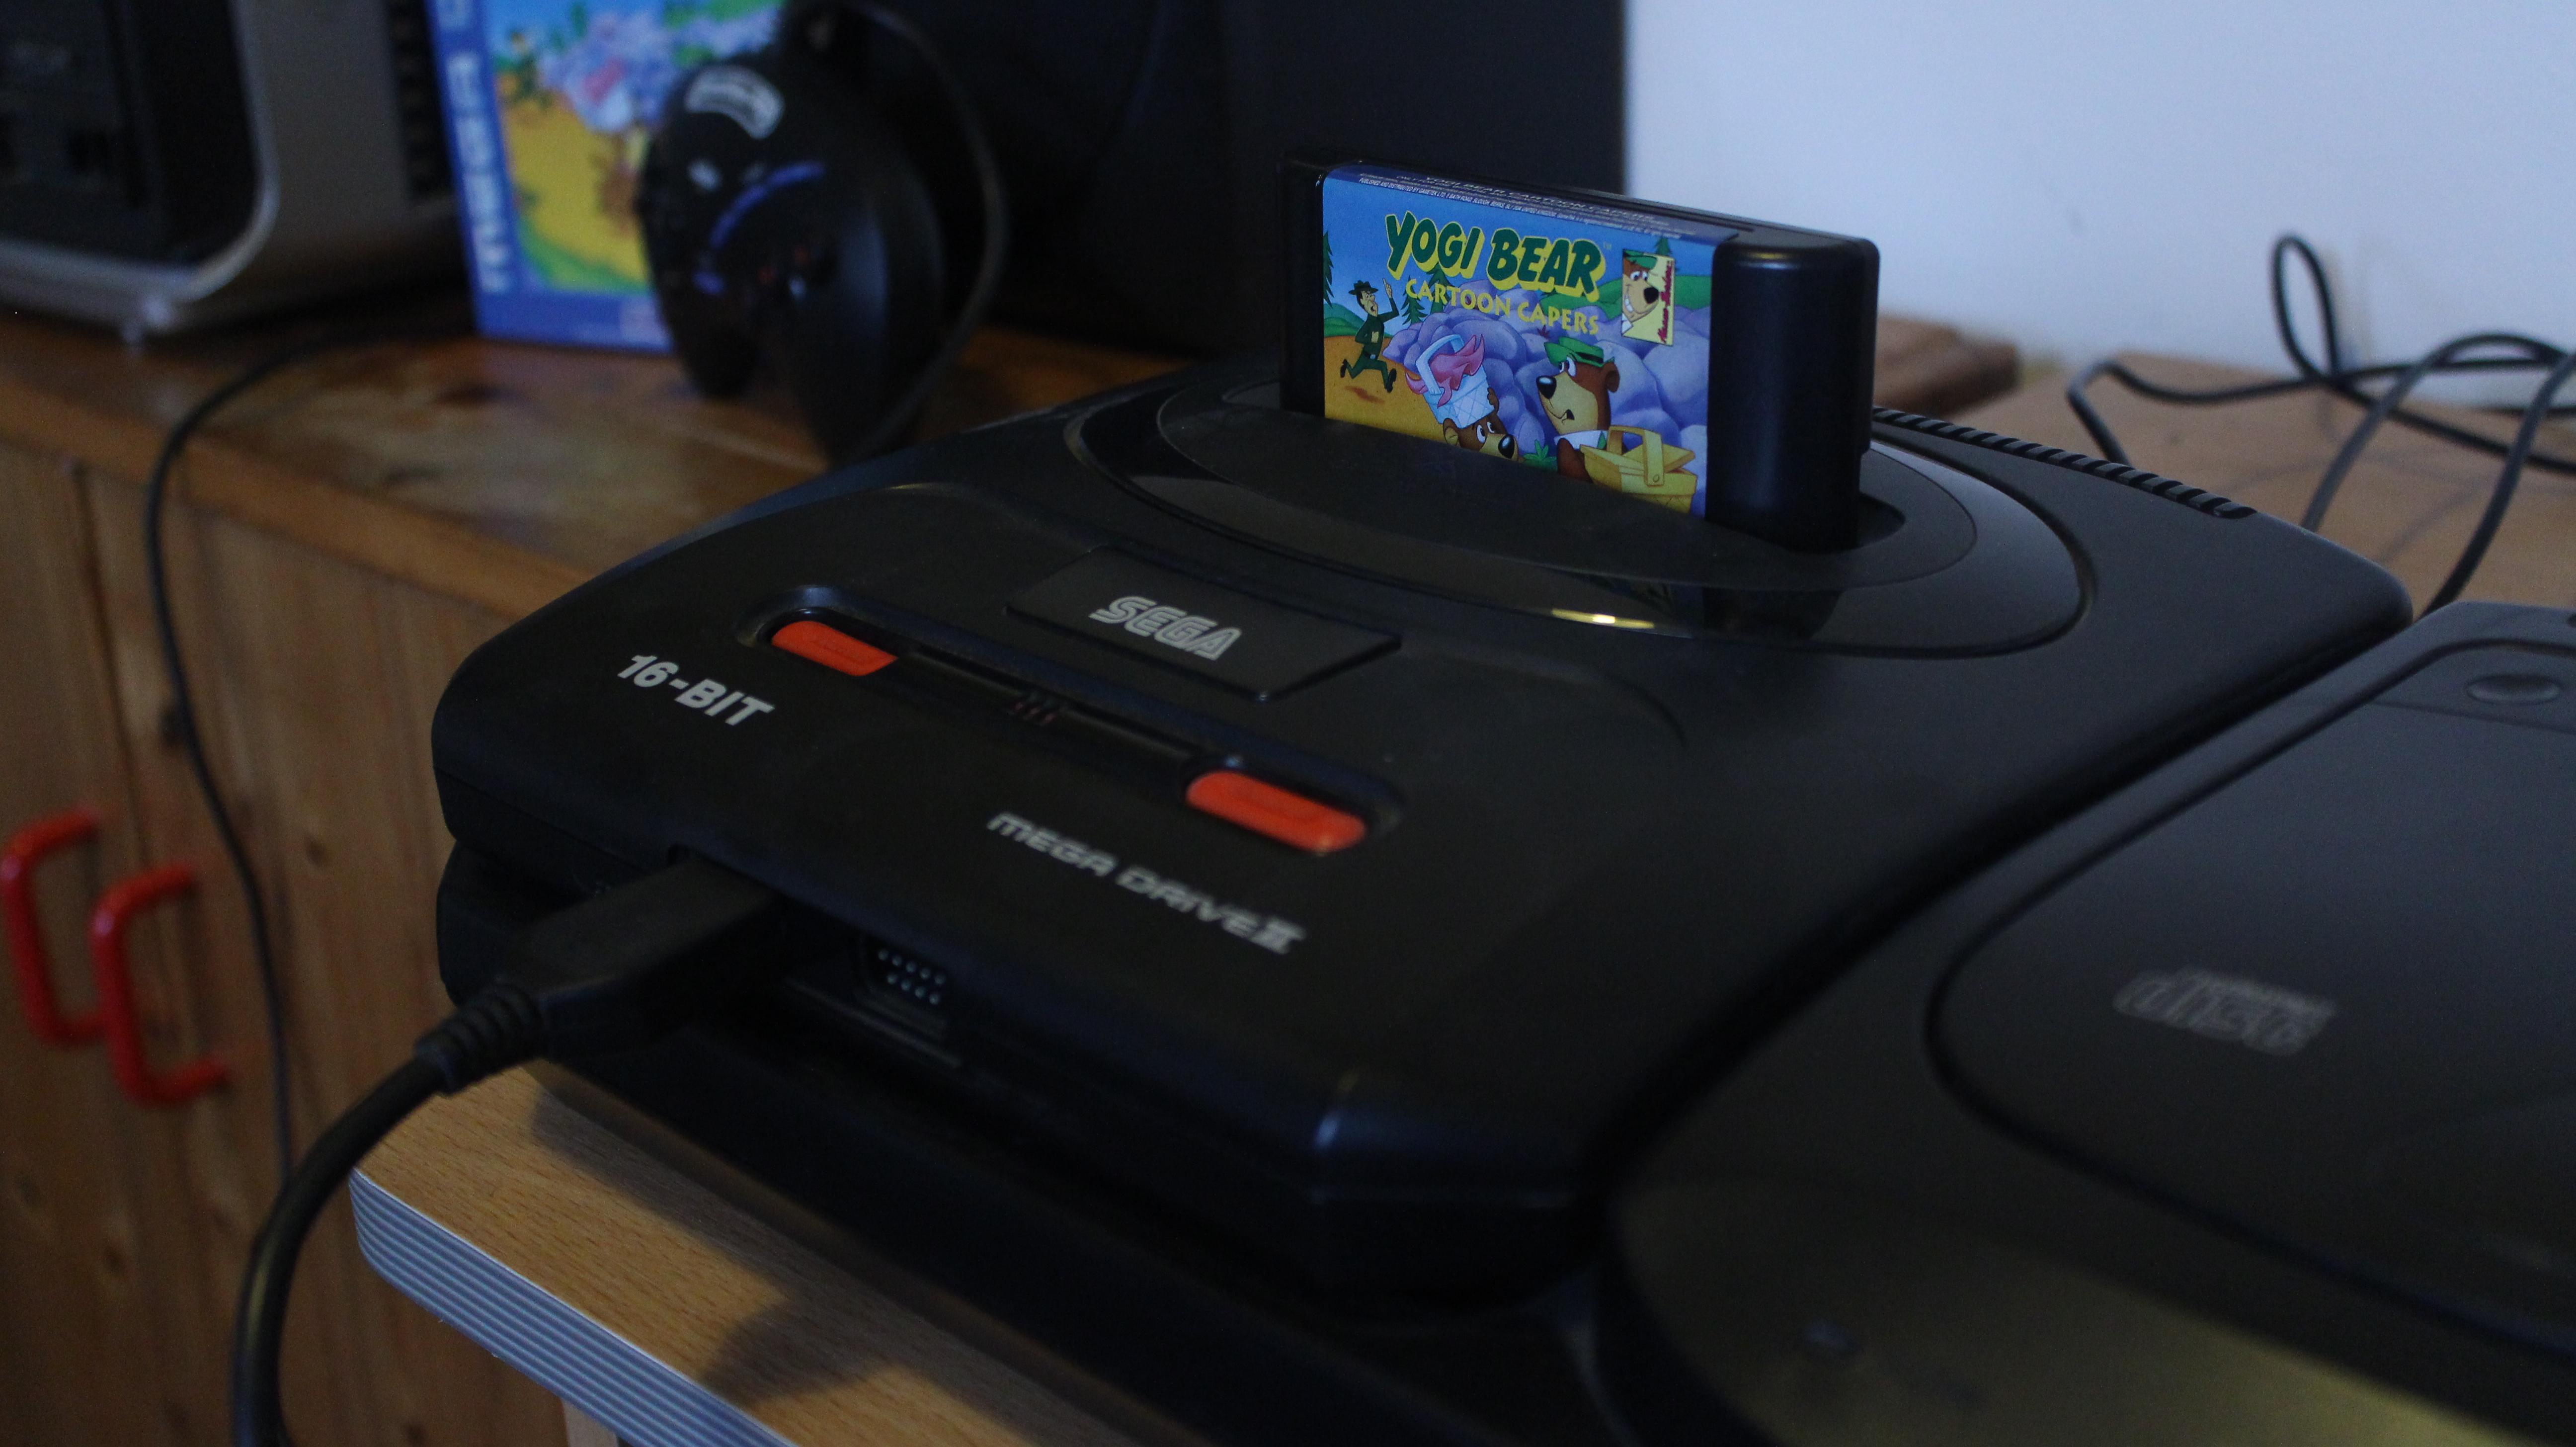 Bartjaah: Yogi Bear: Cartoon Capers (Sega Genesis / MegaDrive) 187,540 points on 2015-12-08 08:28:52